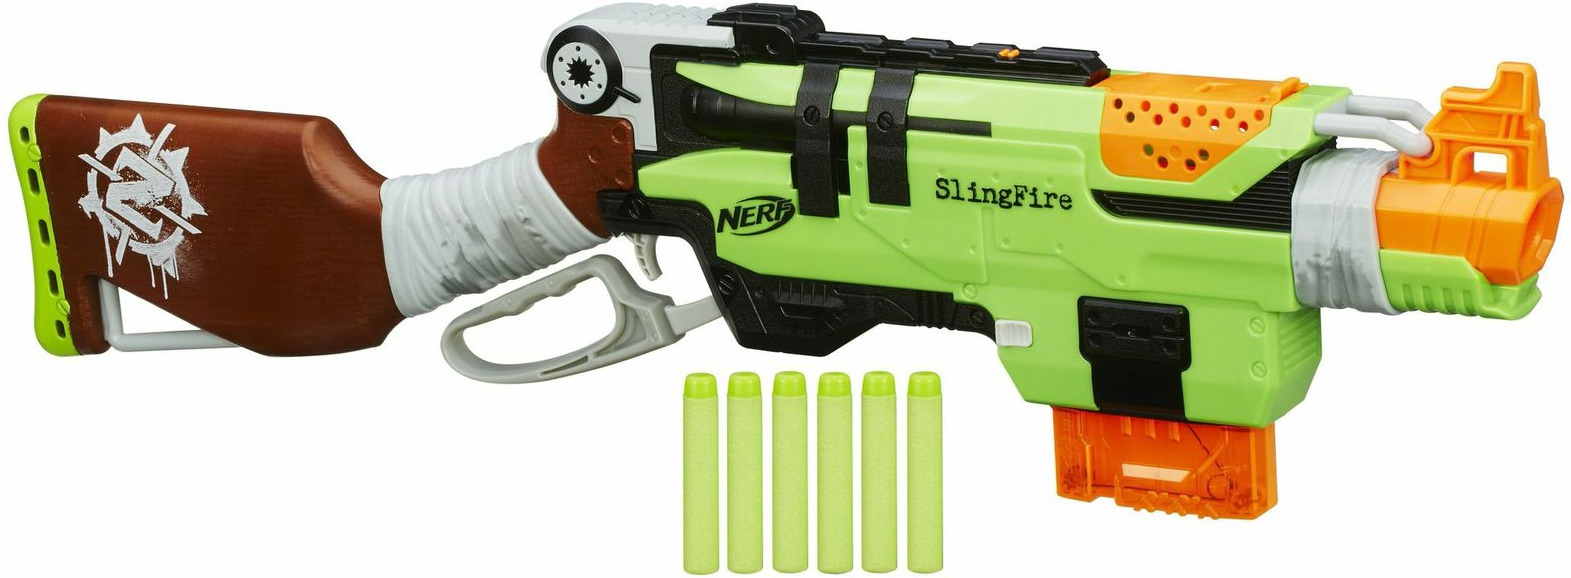 ... Nerf Zombie Strike - Sling Fire image